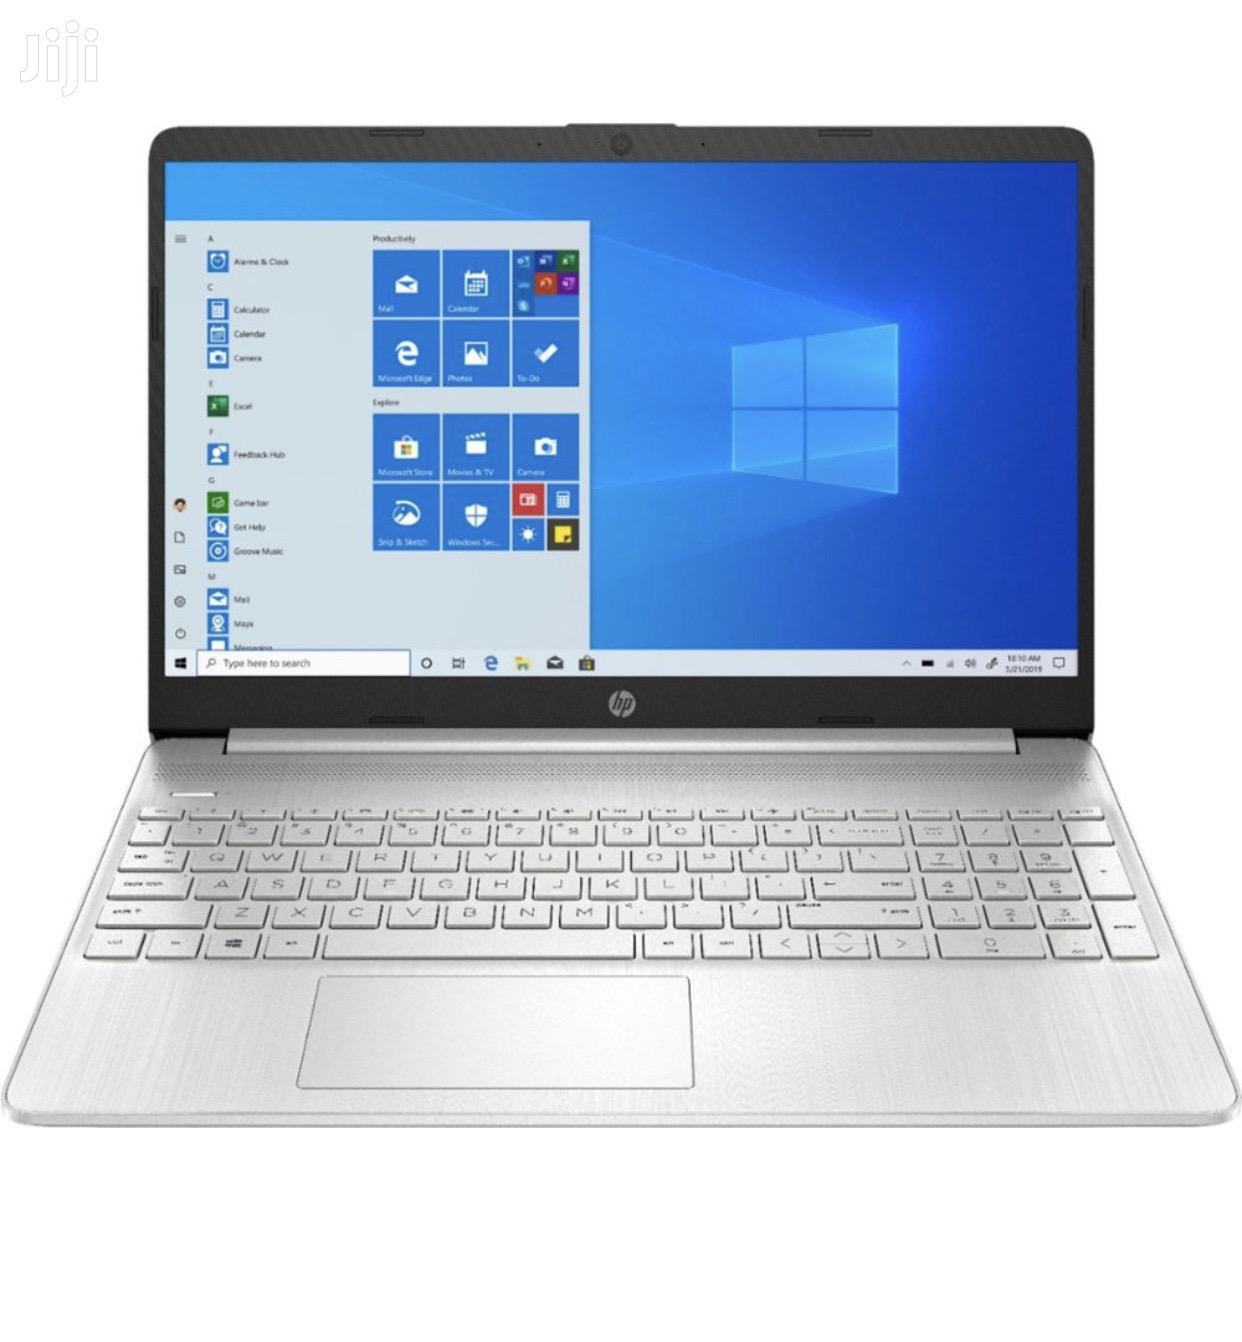 New Laptop HP Pavilion 15 8GB Intel Core I7 SSD 256GB   Laptops & Computers for sale in Kumasi Metropolitan, Ashanti, Ghana